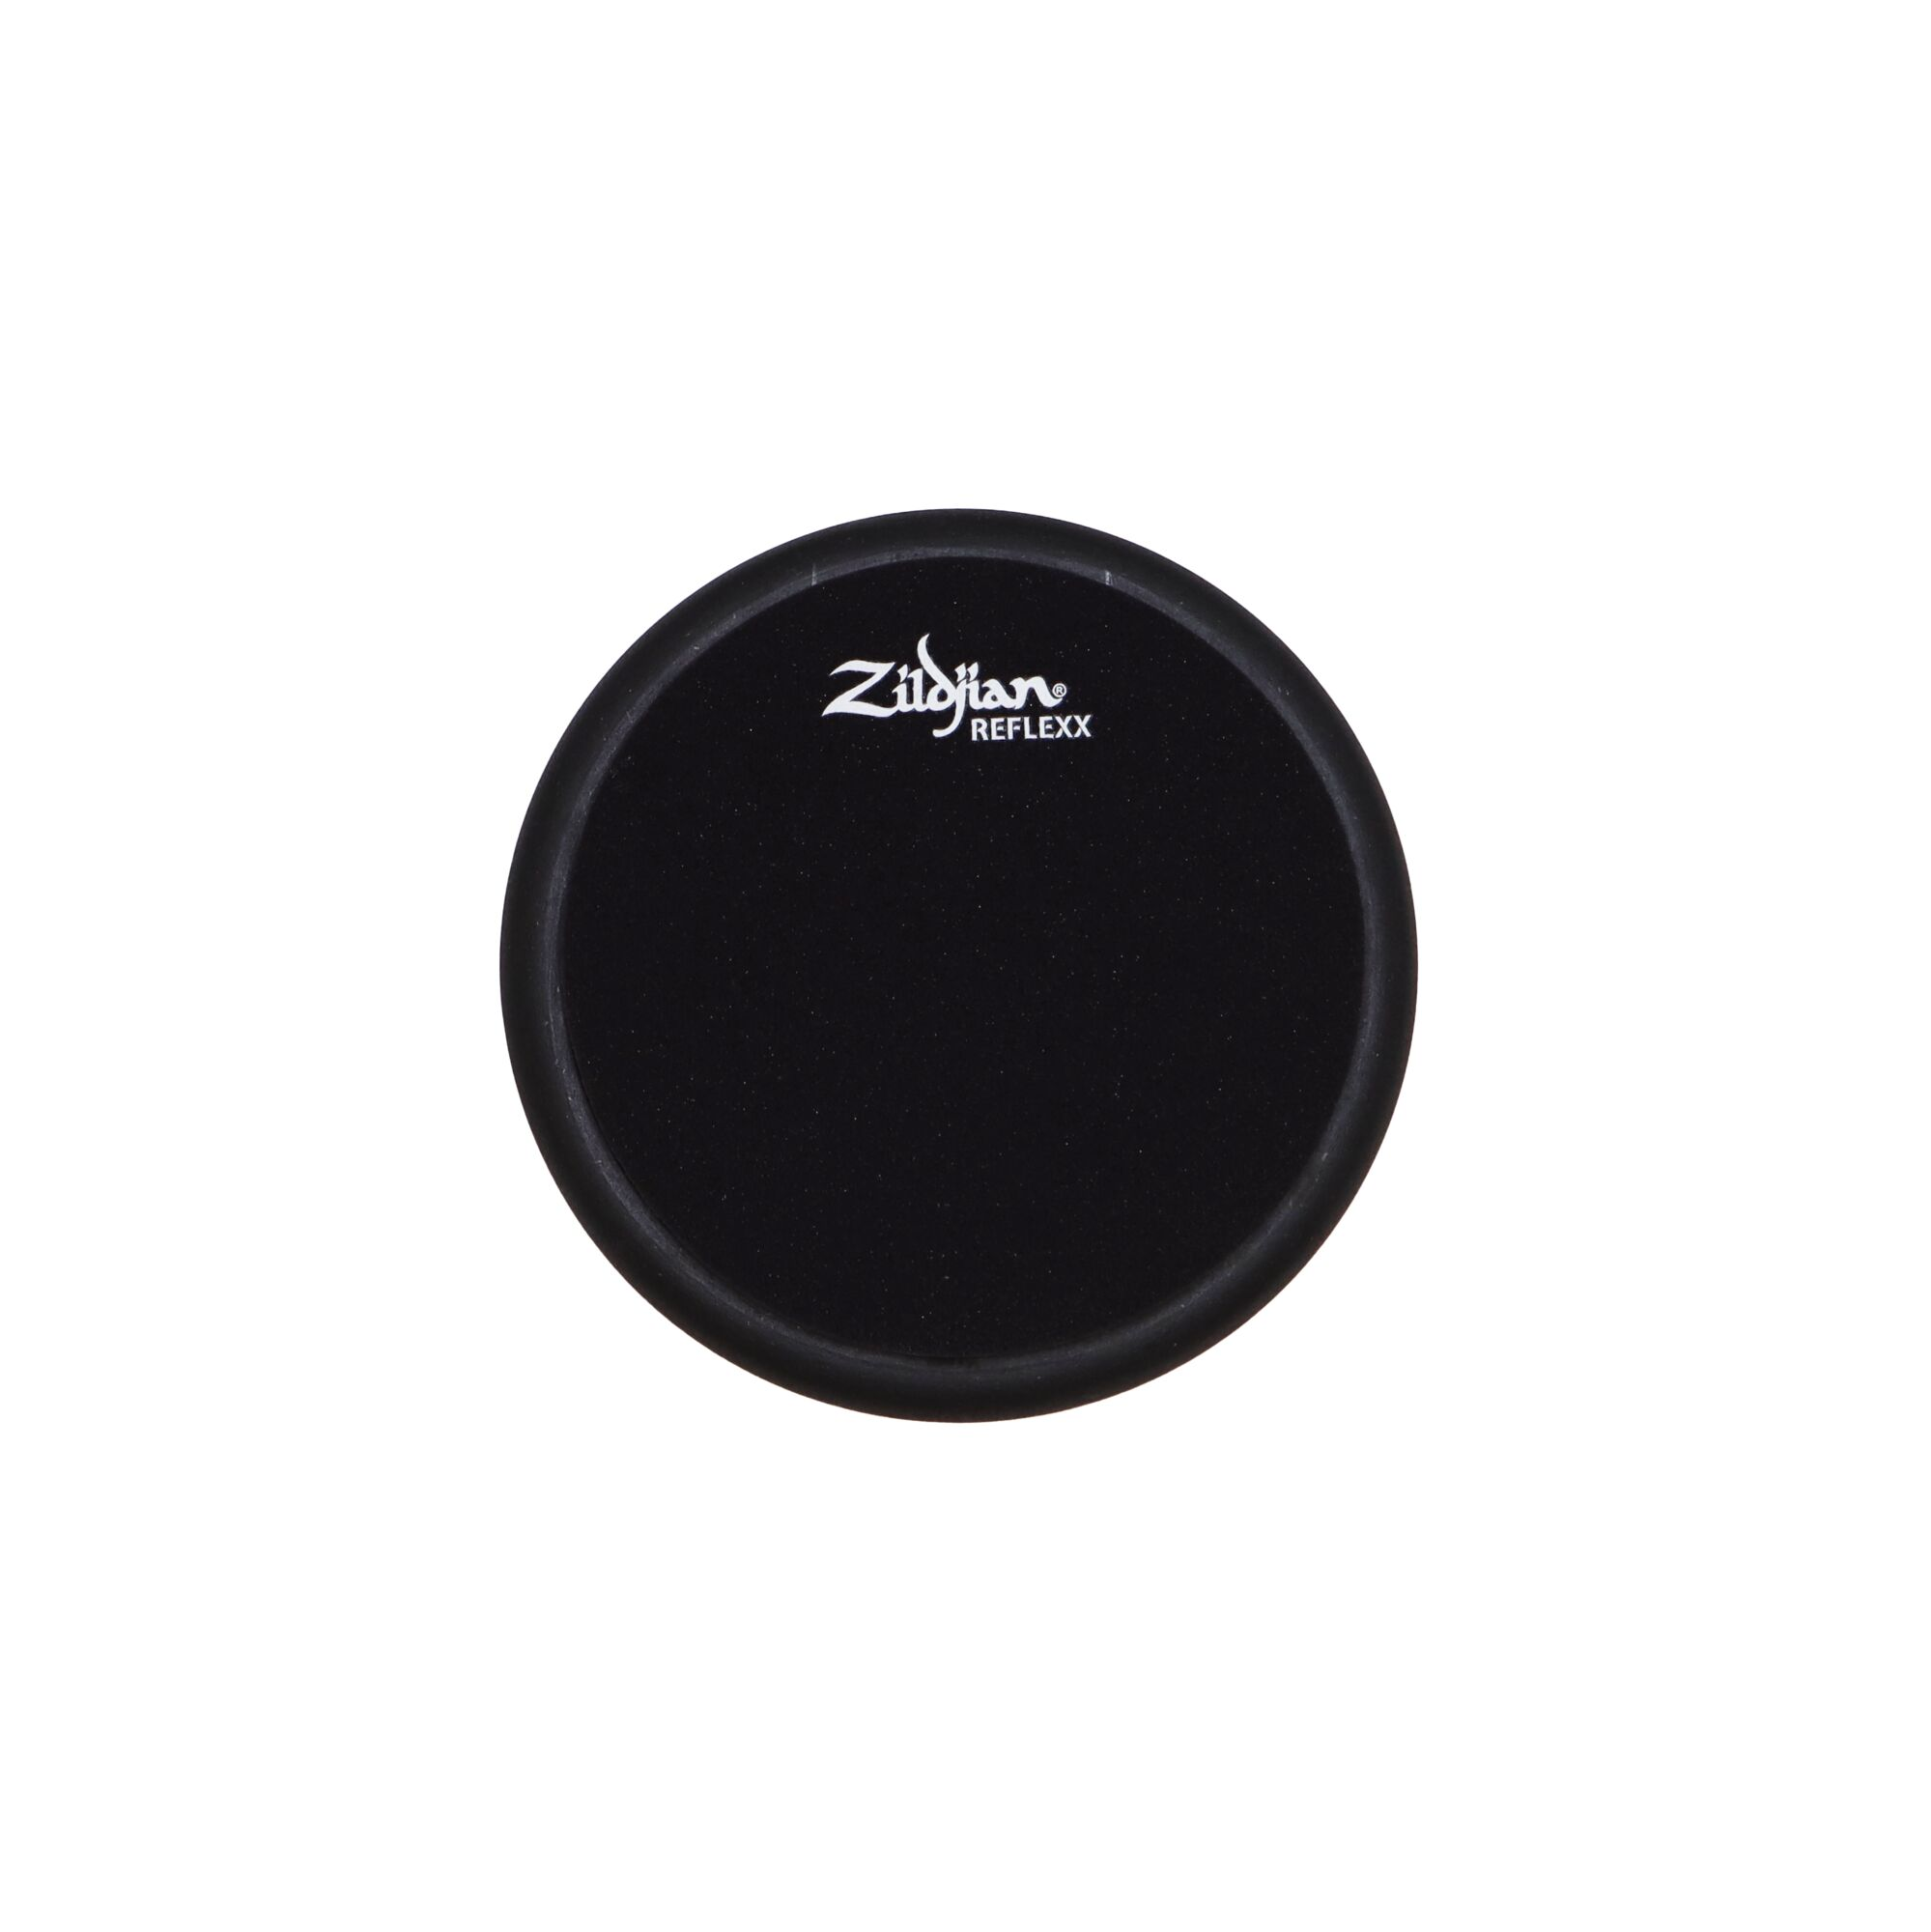 "Zildjian 6"" Reflexx Conditioning Pad"